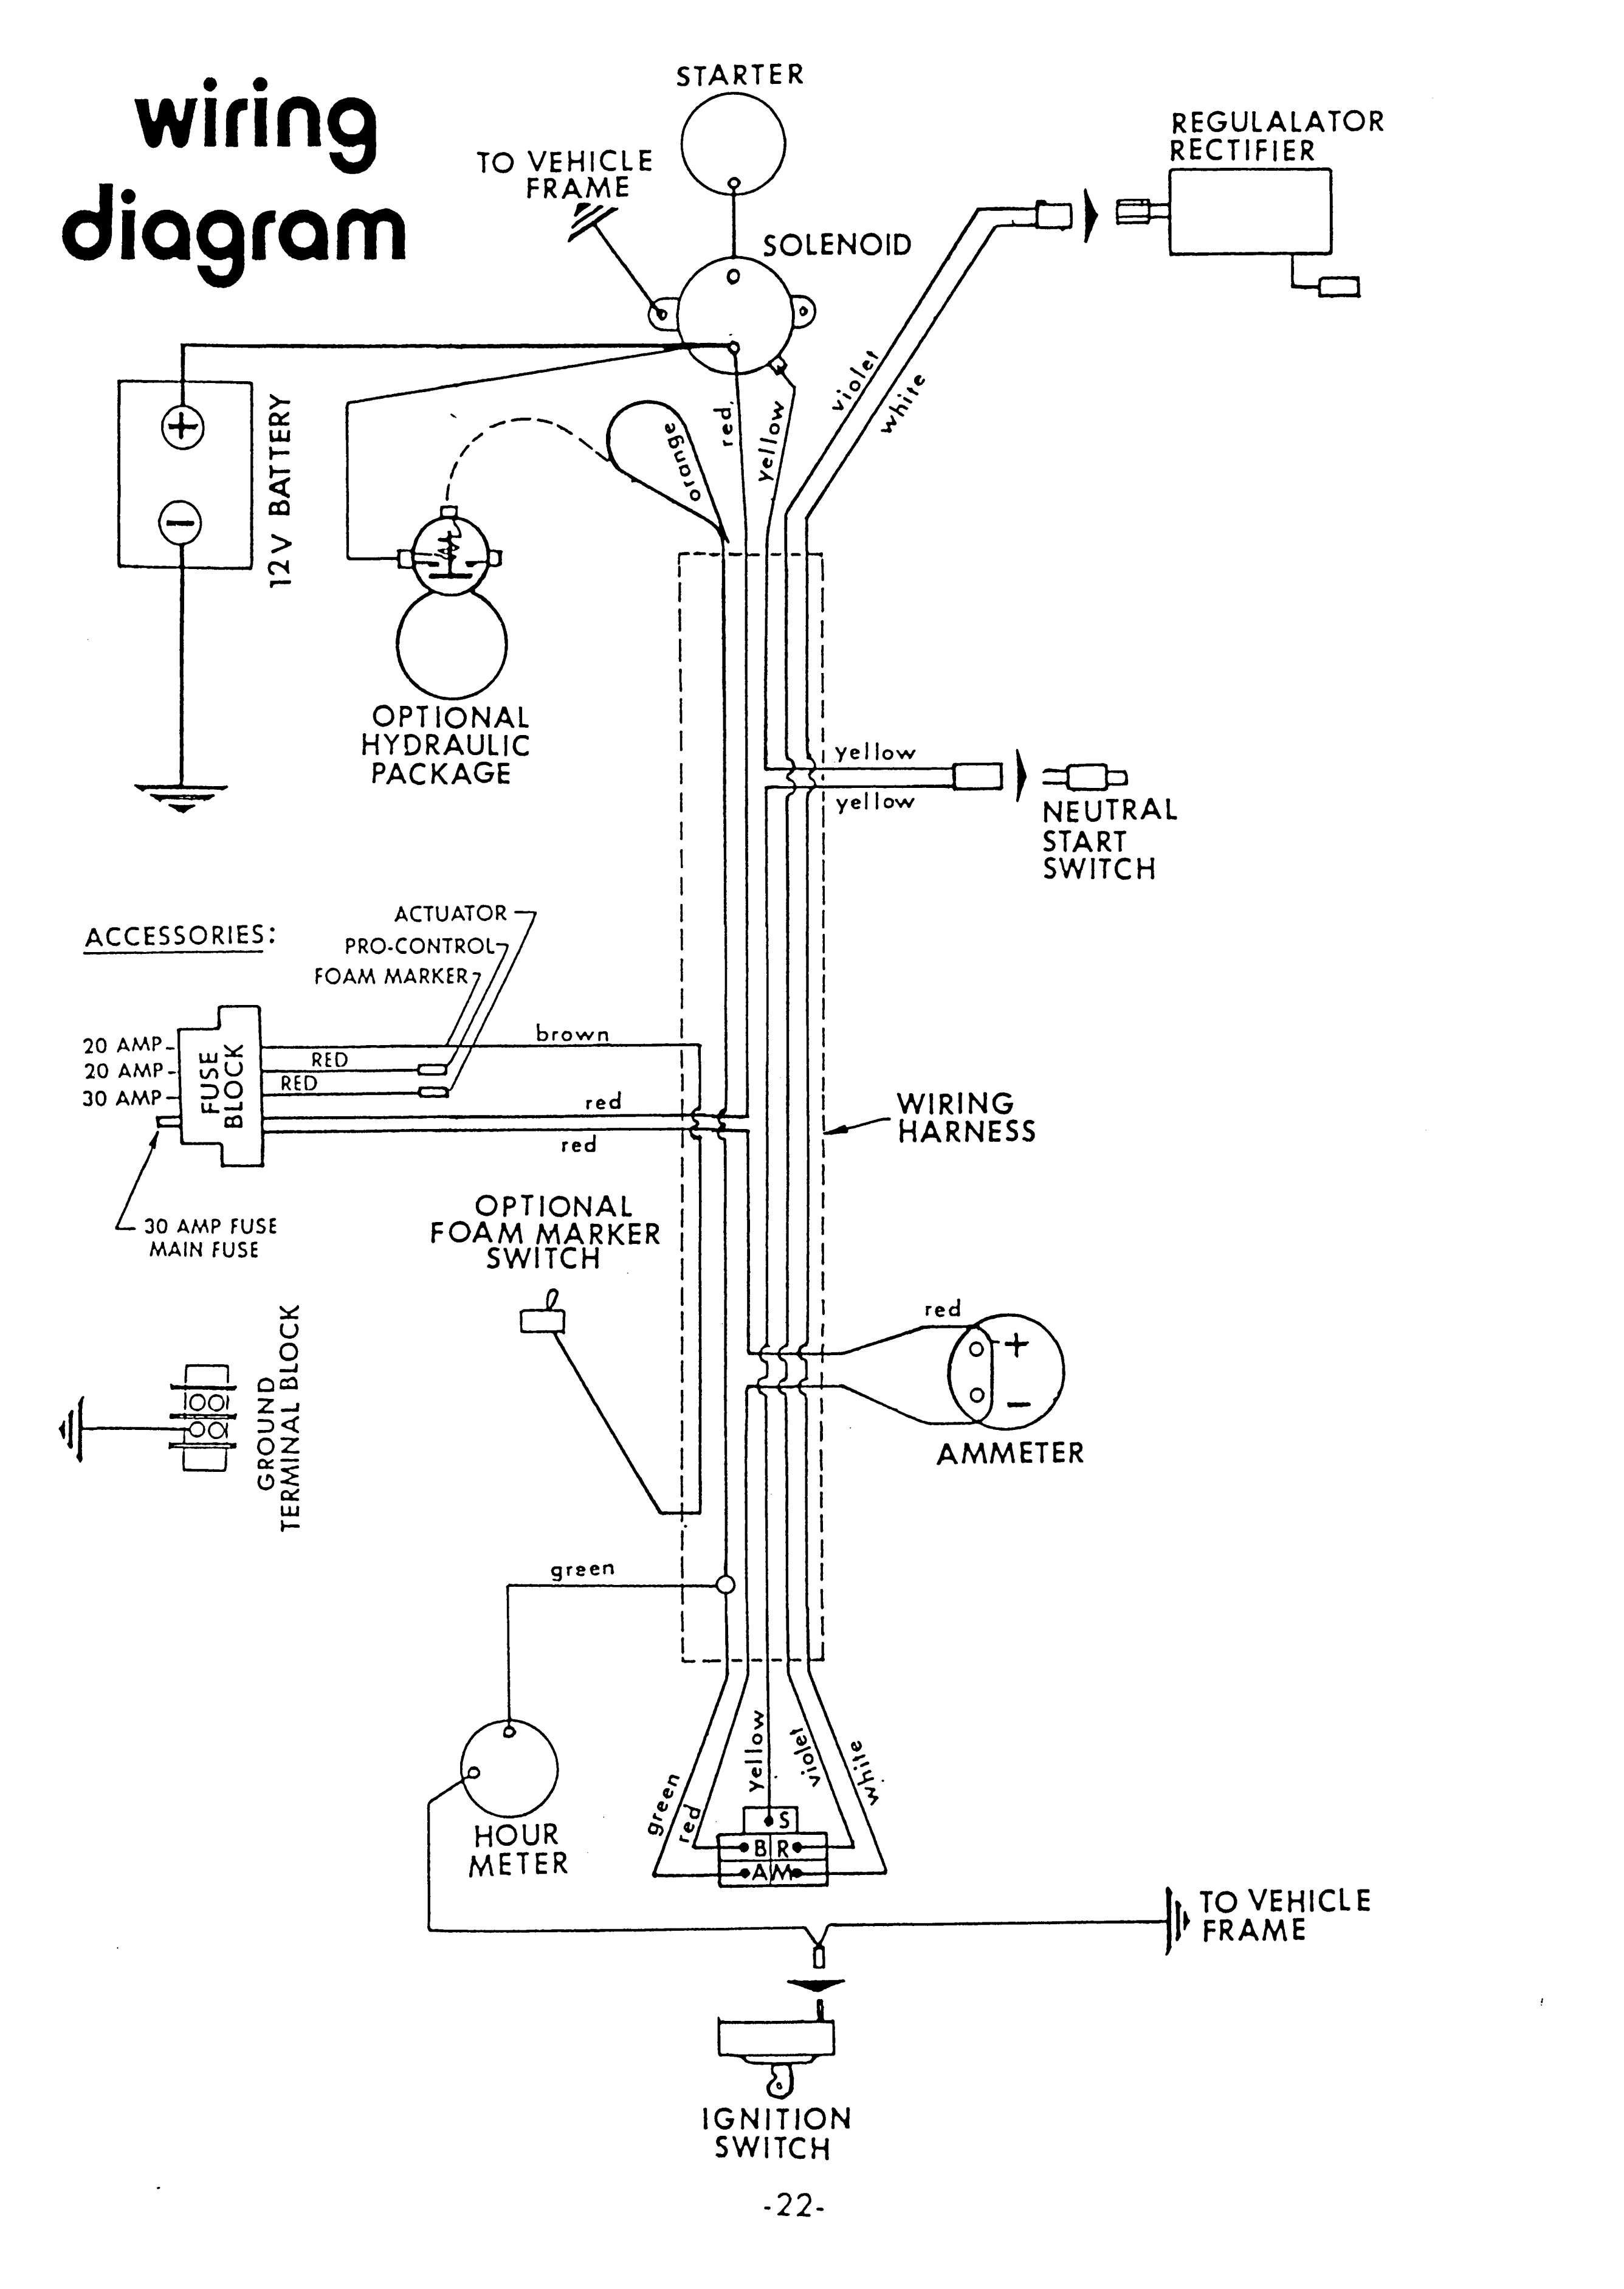 15 Wiring Diagram For Lawn Mower Kohler Engine Engine Diagram Wiringg Net Kohler Engines Diagram Engineering